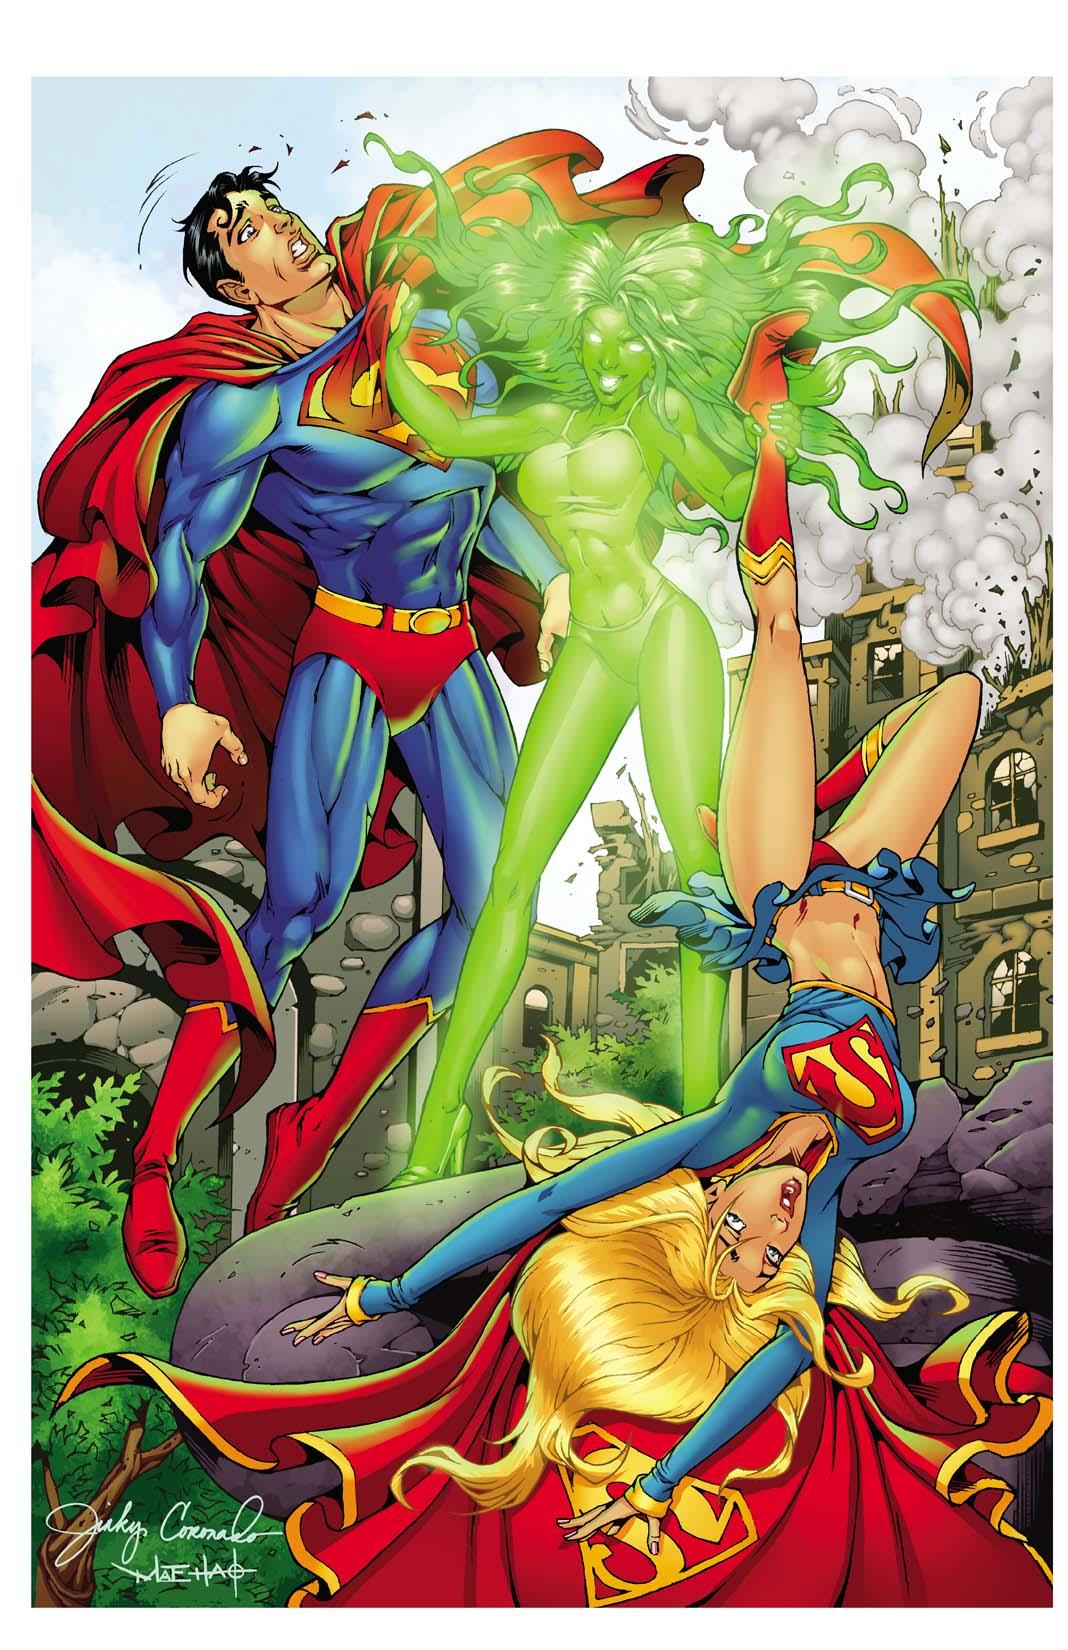 SUPERMAN & SUPERGIRL VS. KRYPTONITE GIRL!